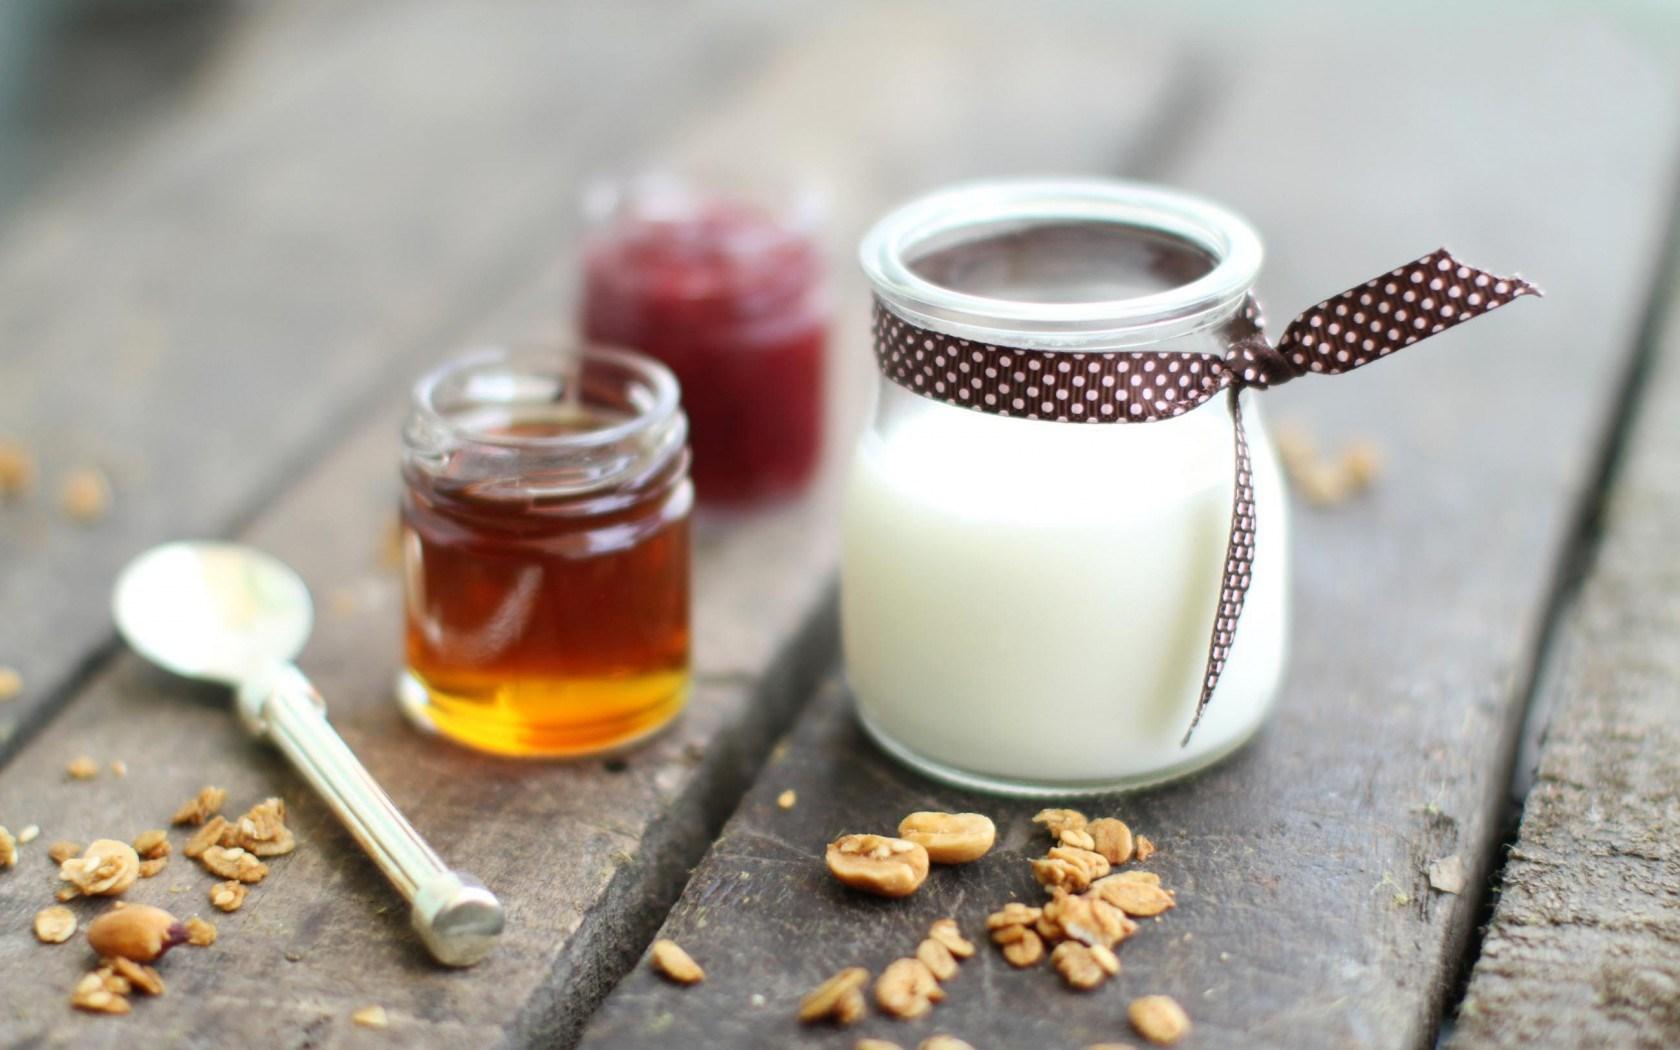 6960972-dessert-panna-cotta-honey-jam-nuts-food.jpg